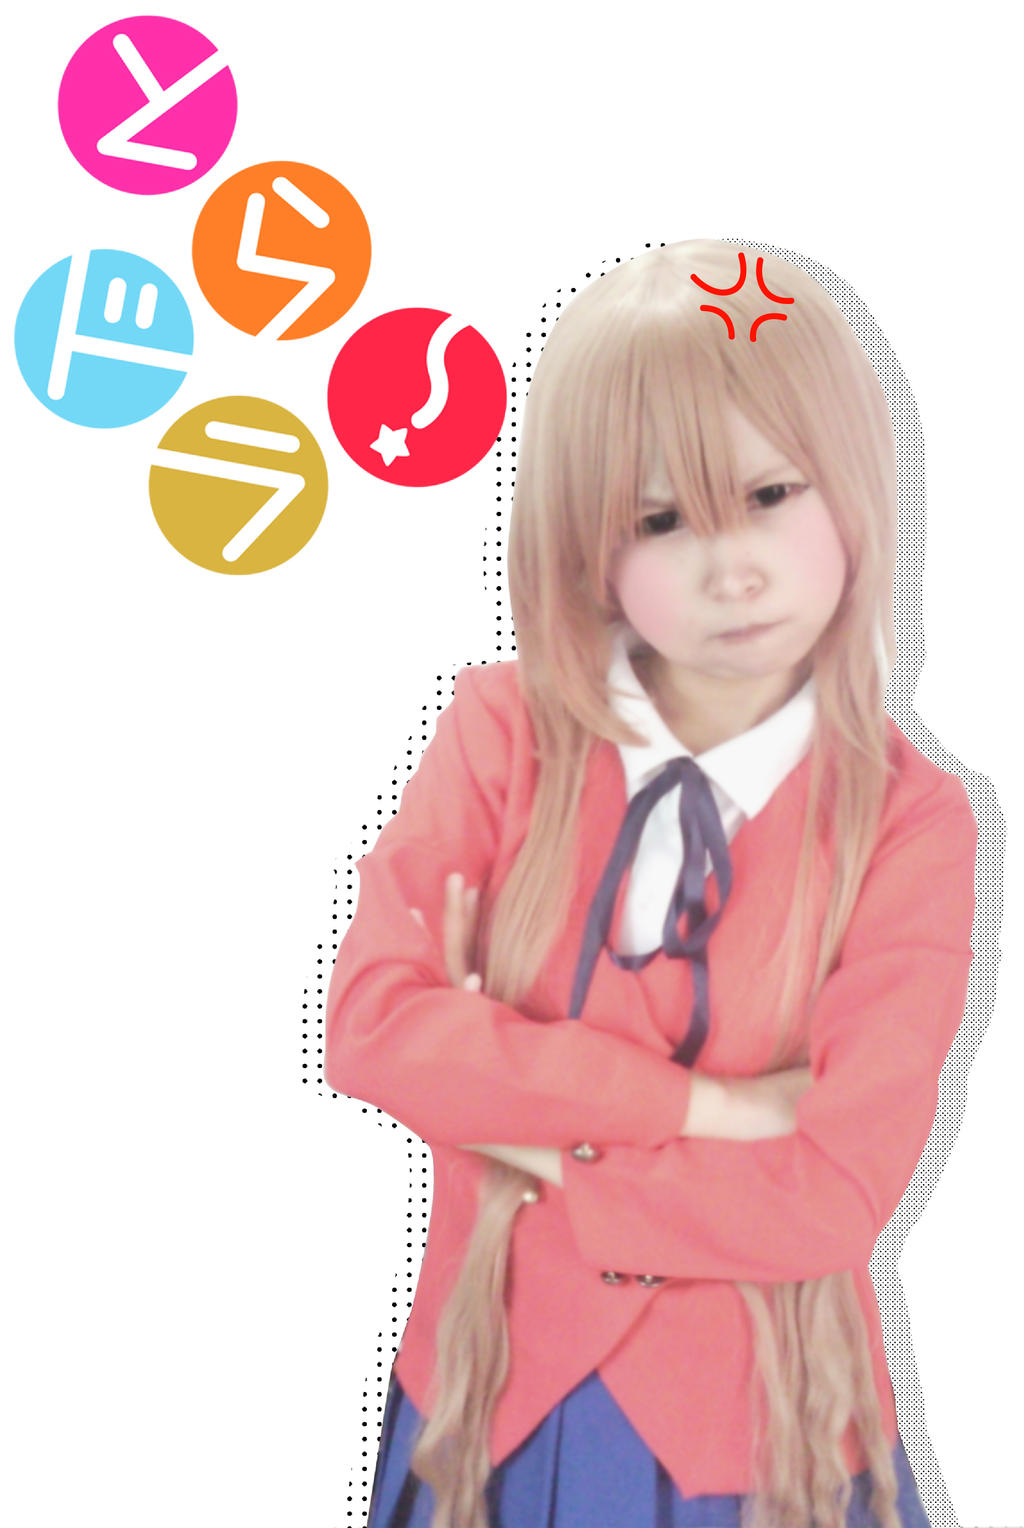 Taiga Aisaka (Toradora) cosplay by ohmygumiho on DeviantArt